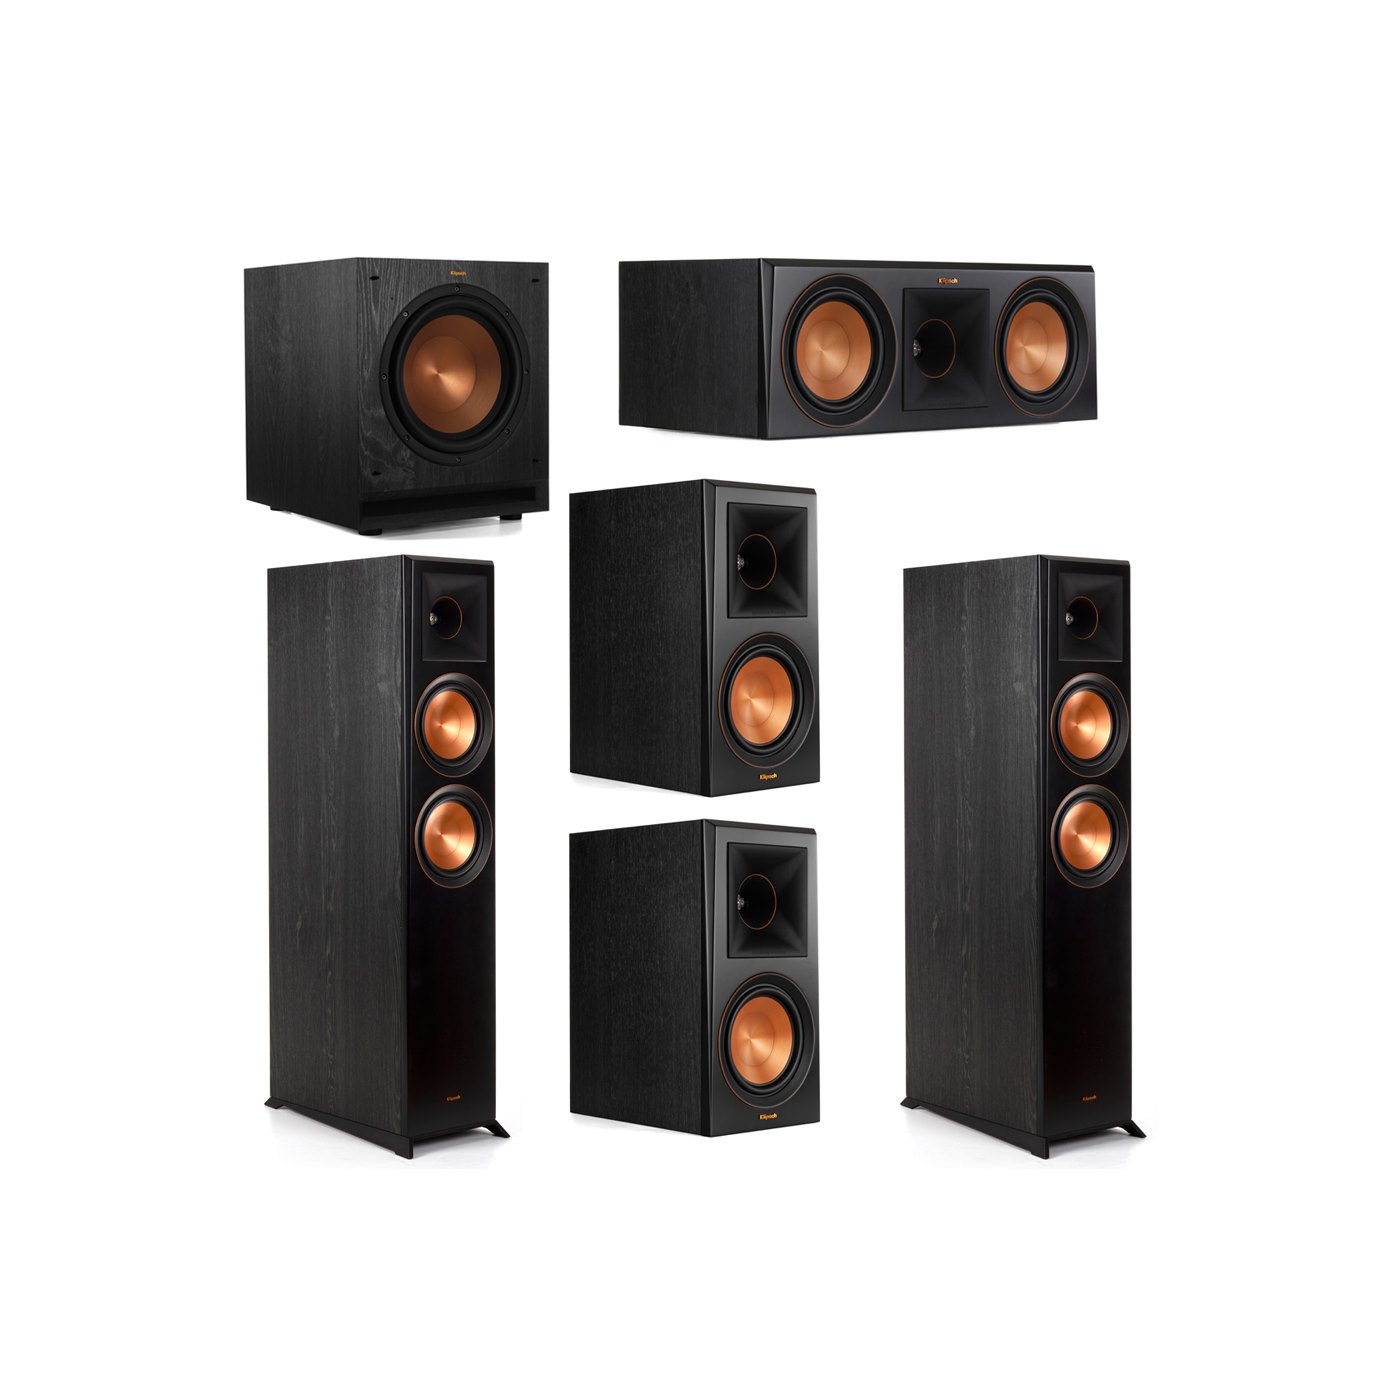 Klipsch 5.1 System with 2 RP-6000F Floorstanding Speakers, 1 Klipsch RP-600C Center Speaker, 2 Klipsch RP-600M Surround Speakers, 1 Klipsch SPL-100 Subwoofer